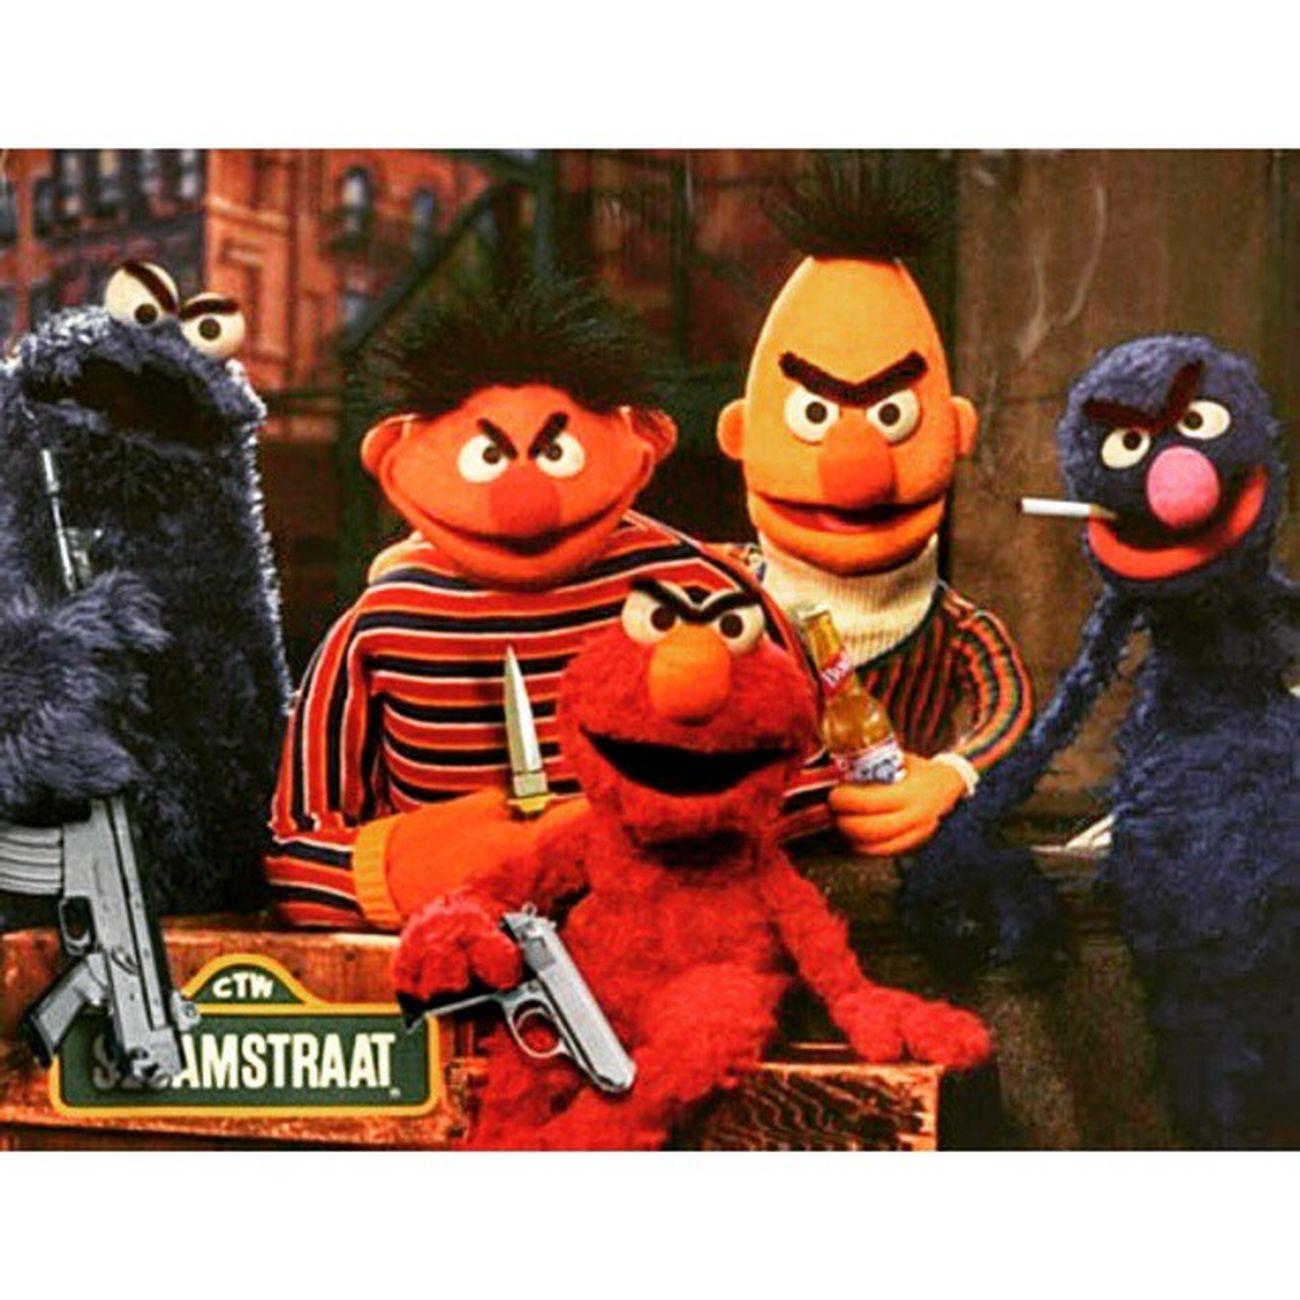 Susamsokağı Susamstreet Street Kurabiyecanavarı cookiemonster monsters